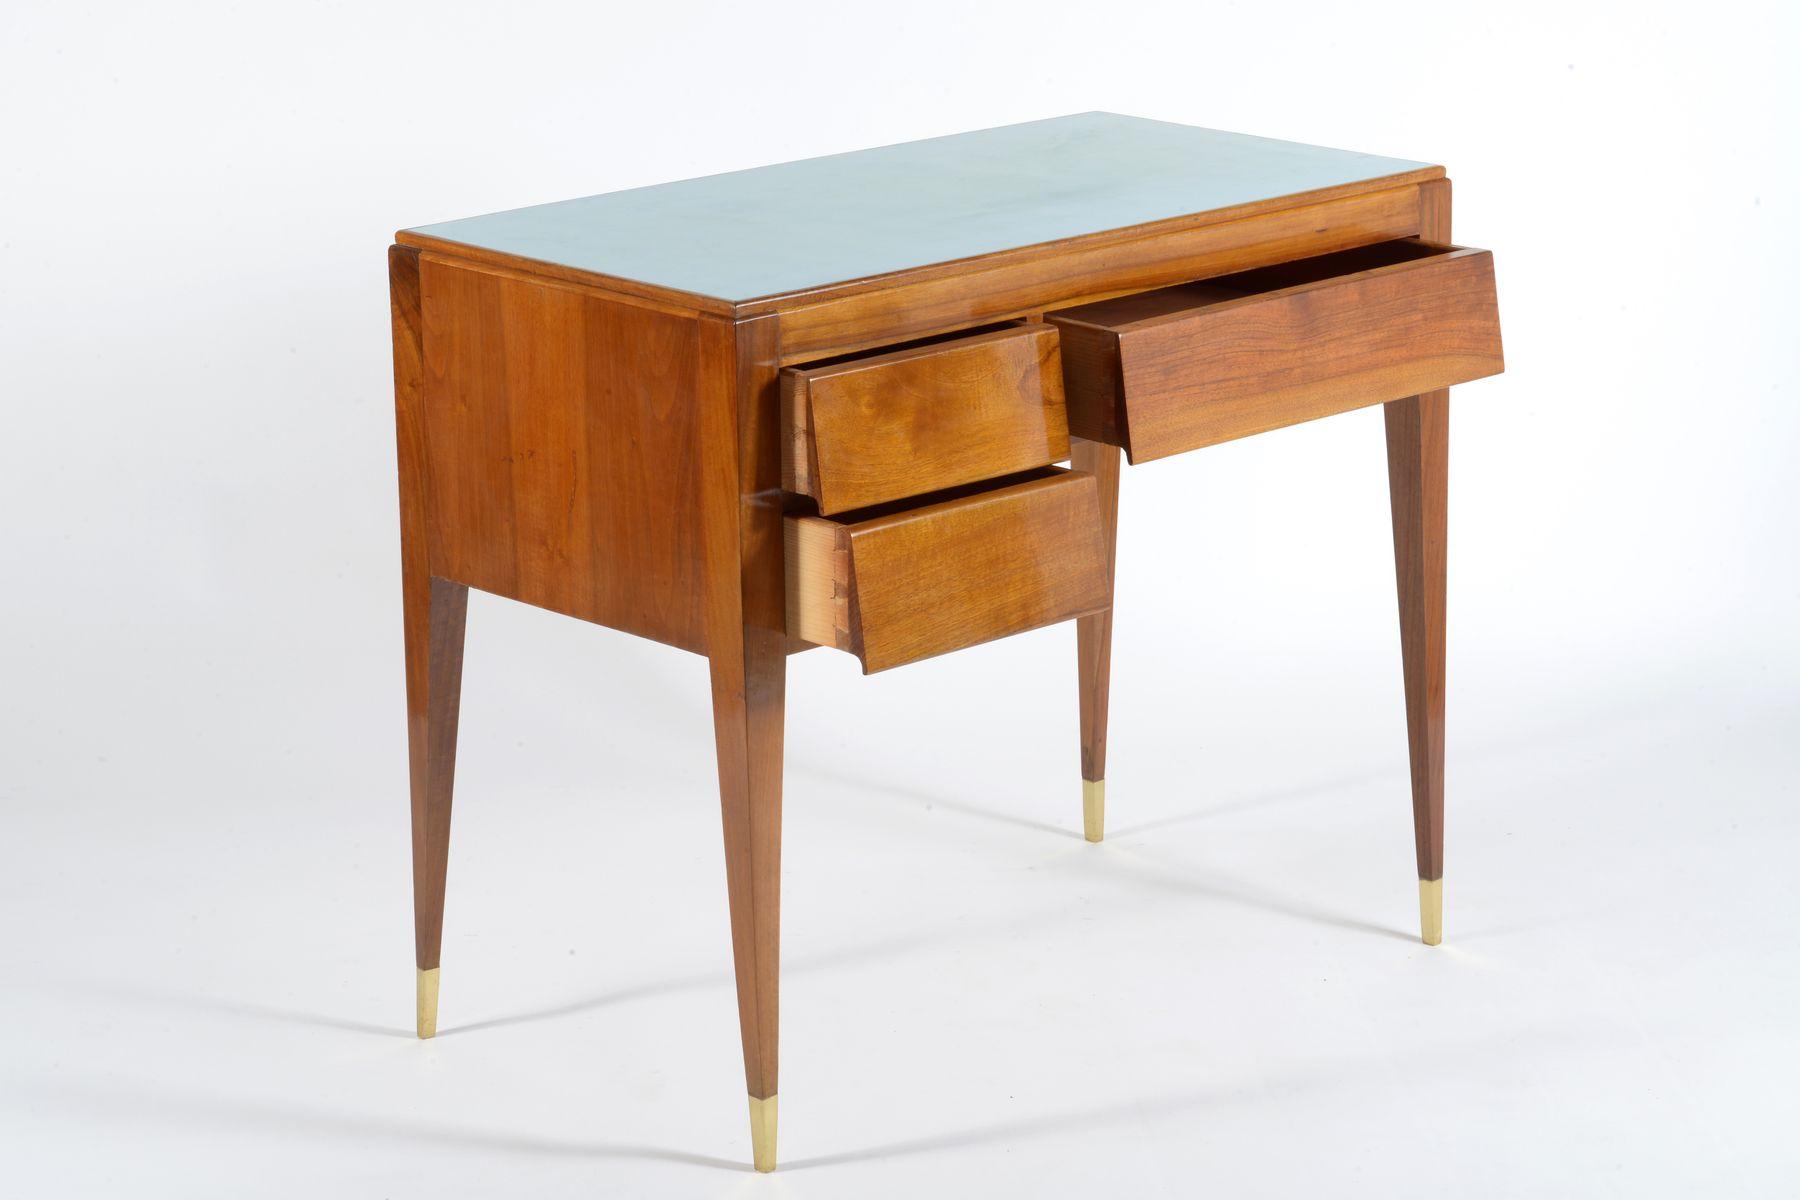 bureau mid century en noyer massif italie 1955 en vente sur pamono. Black Bedroom Furniture Sets. Home Design Ideas